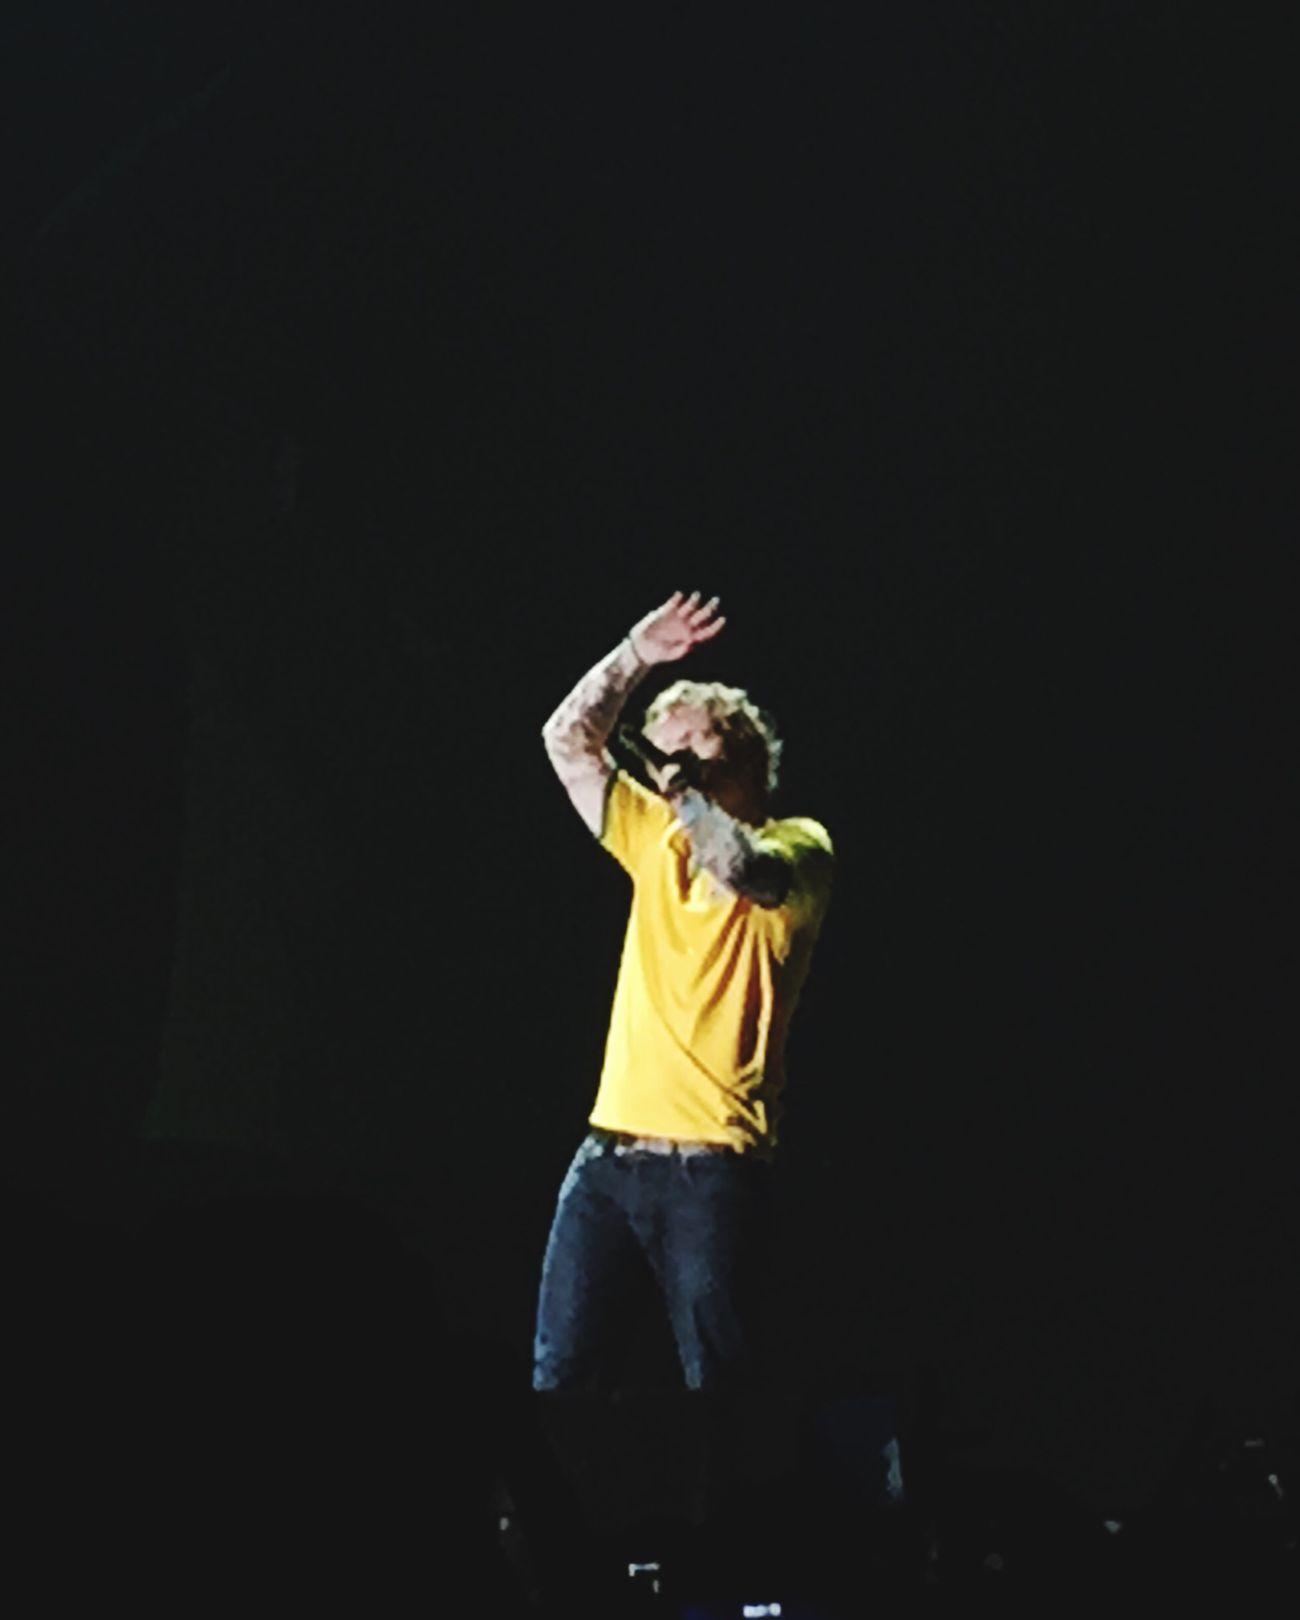 Edsheeran Brasil Brazil Concert Edsheeranconcert Hsbcarena